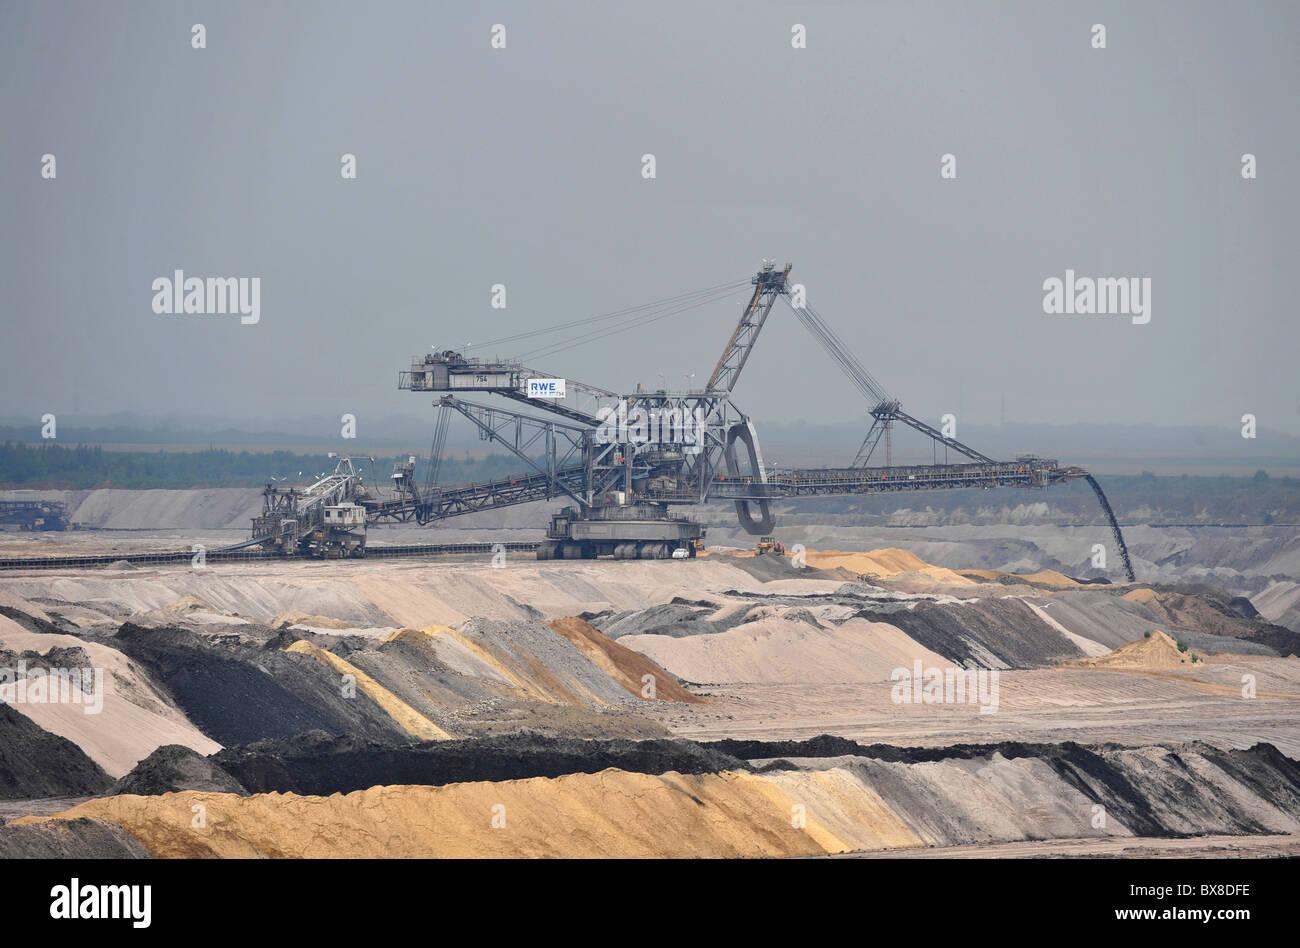 Open cast coal mining near Aachen in Germany on a huge scale using colossal Krupp Bagger 288 bucket wheel excavators Stock Photo